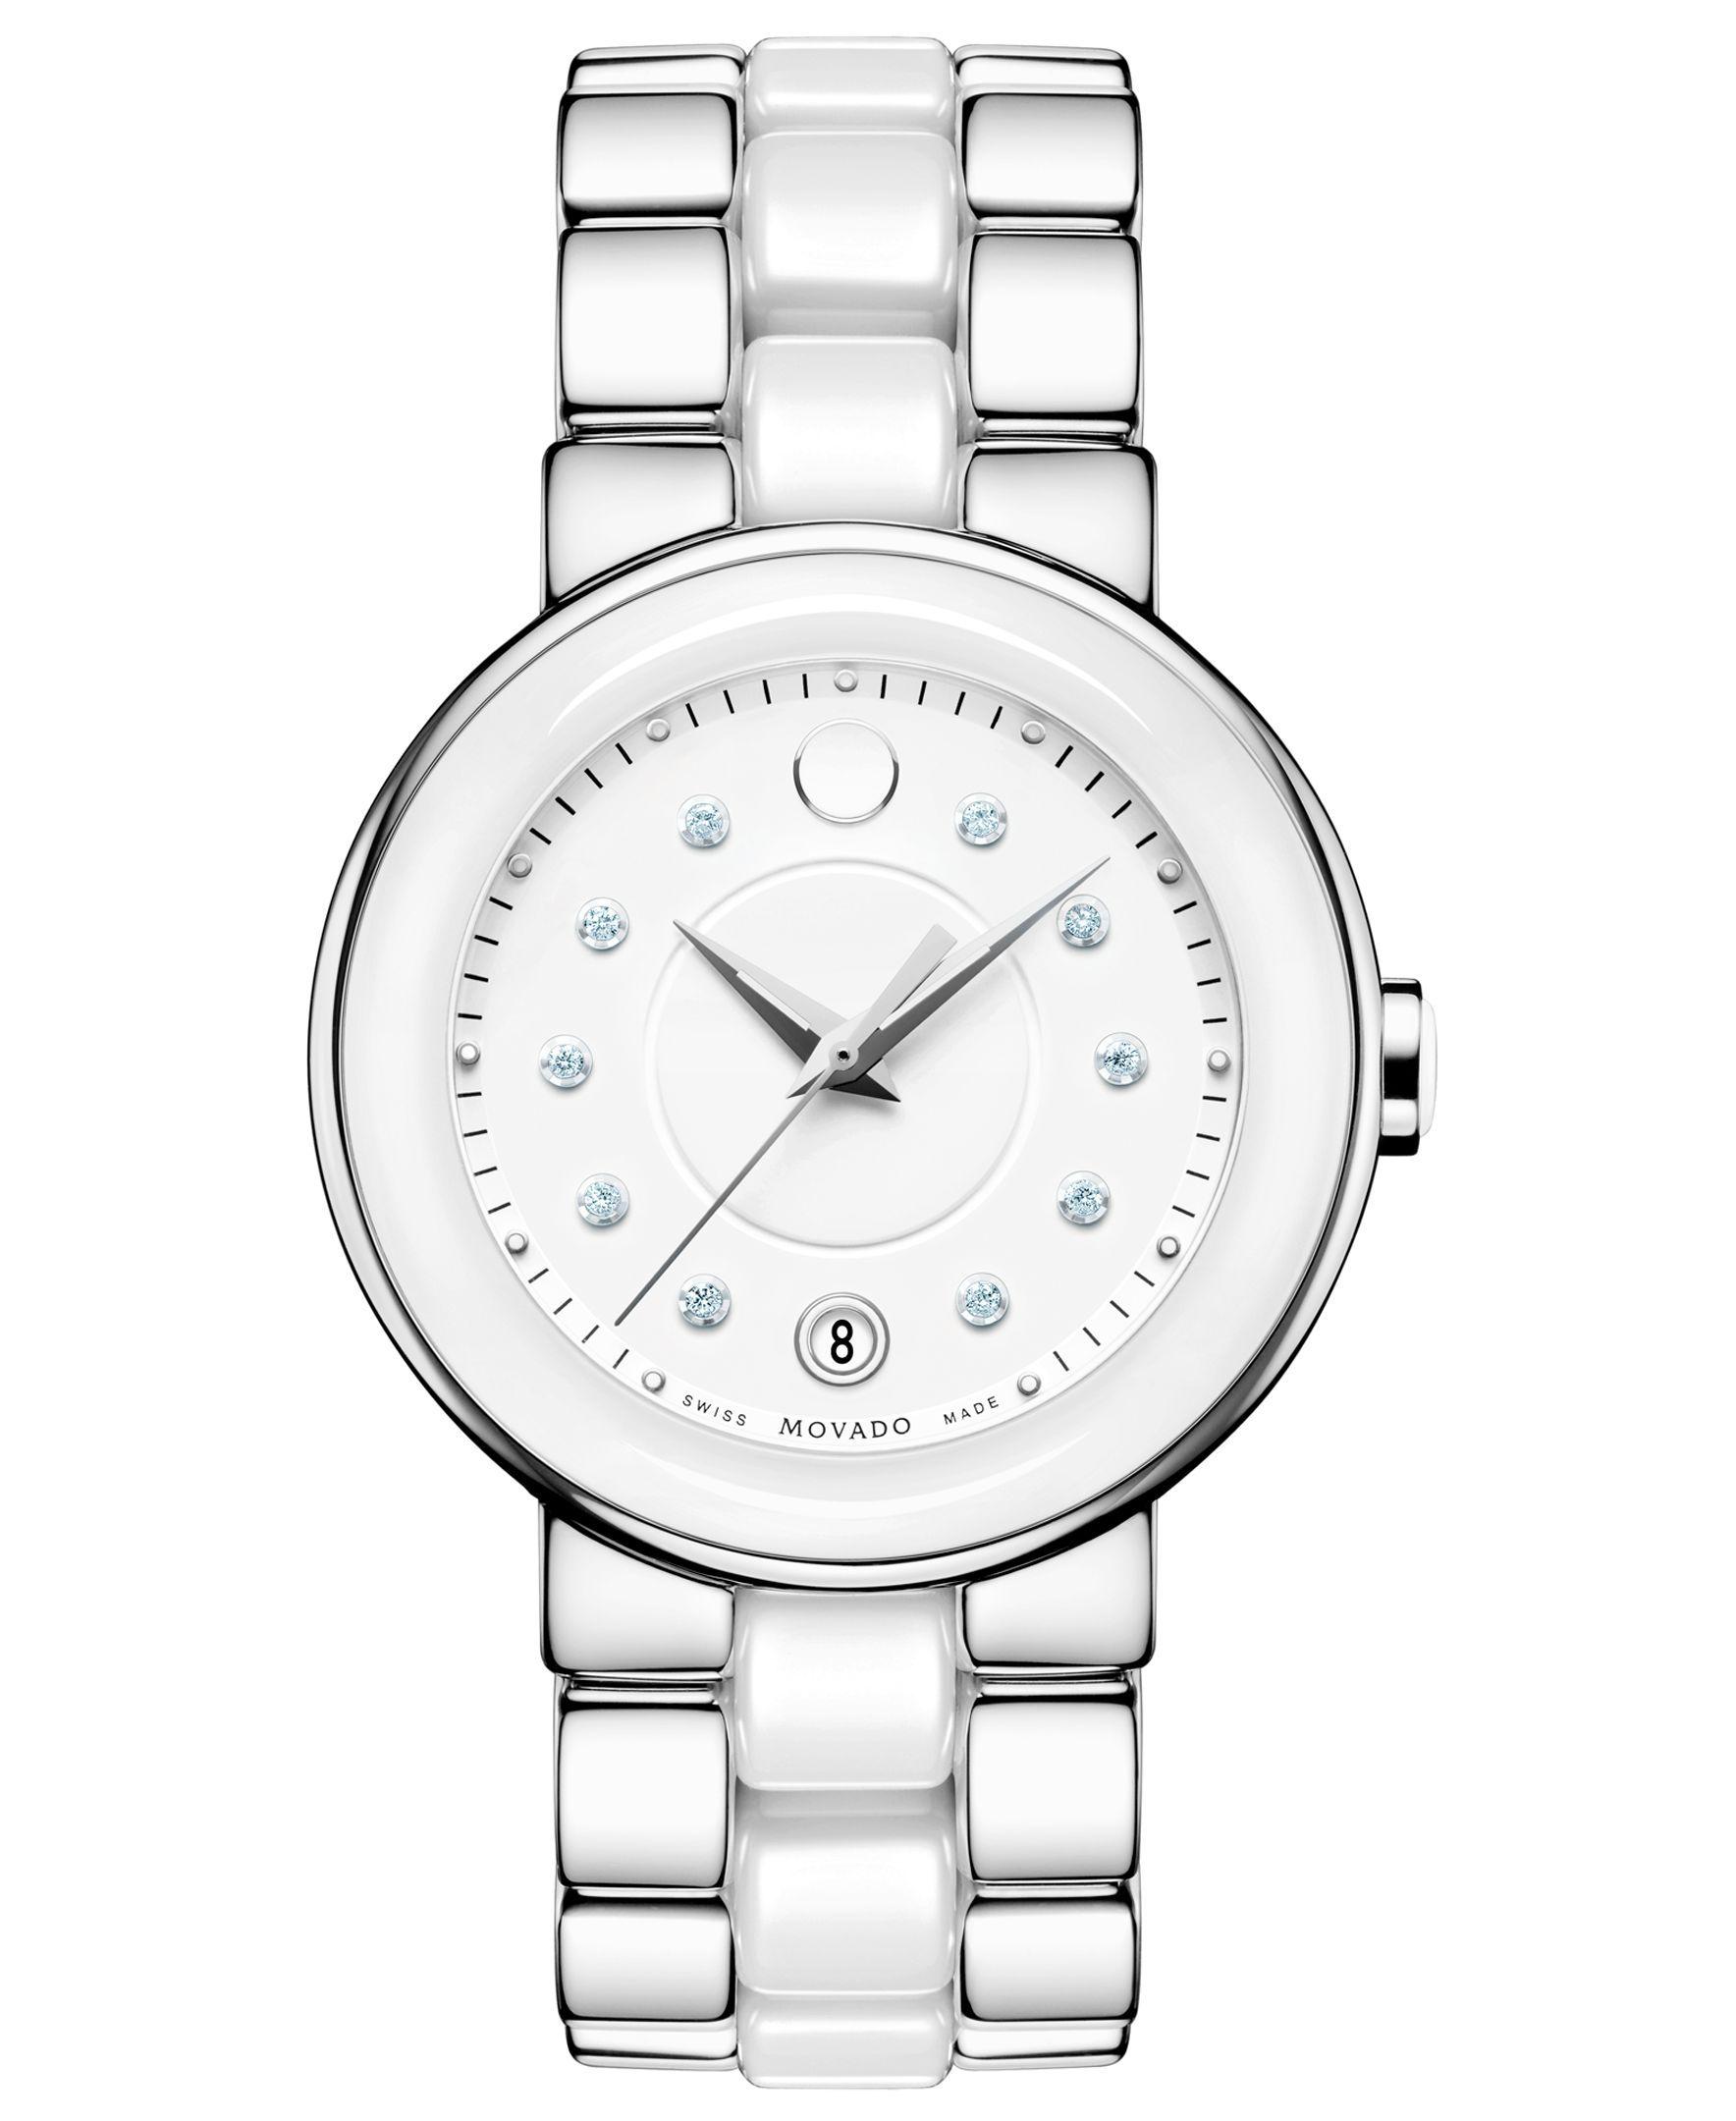 3f3da1ef0 Movado Women's Swiss Cerena Diamond Accent White Ceramic and Stainless Steel  Bracelet Watch 36mm 606540